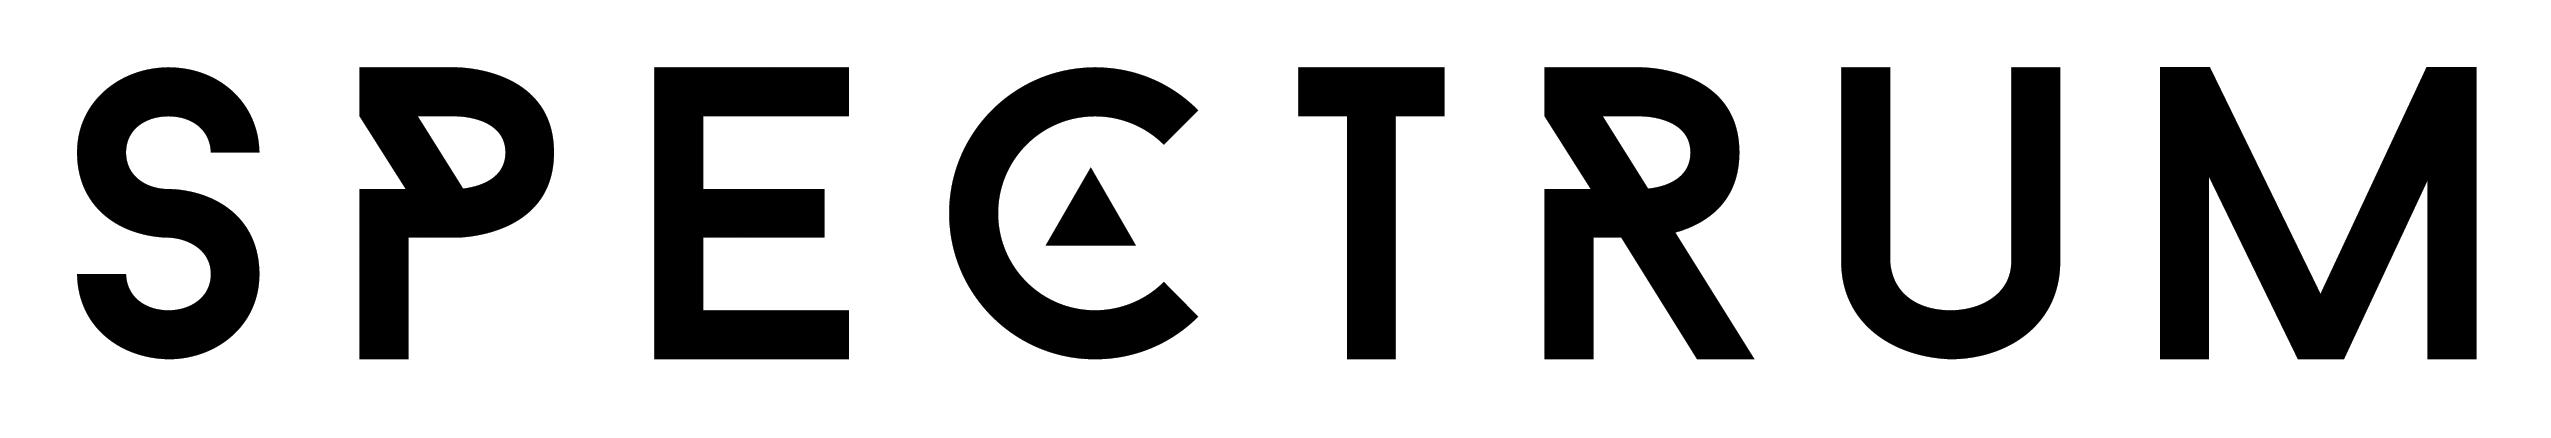 spectrum-logo1